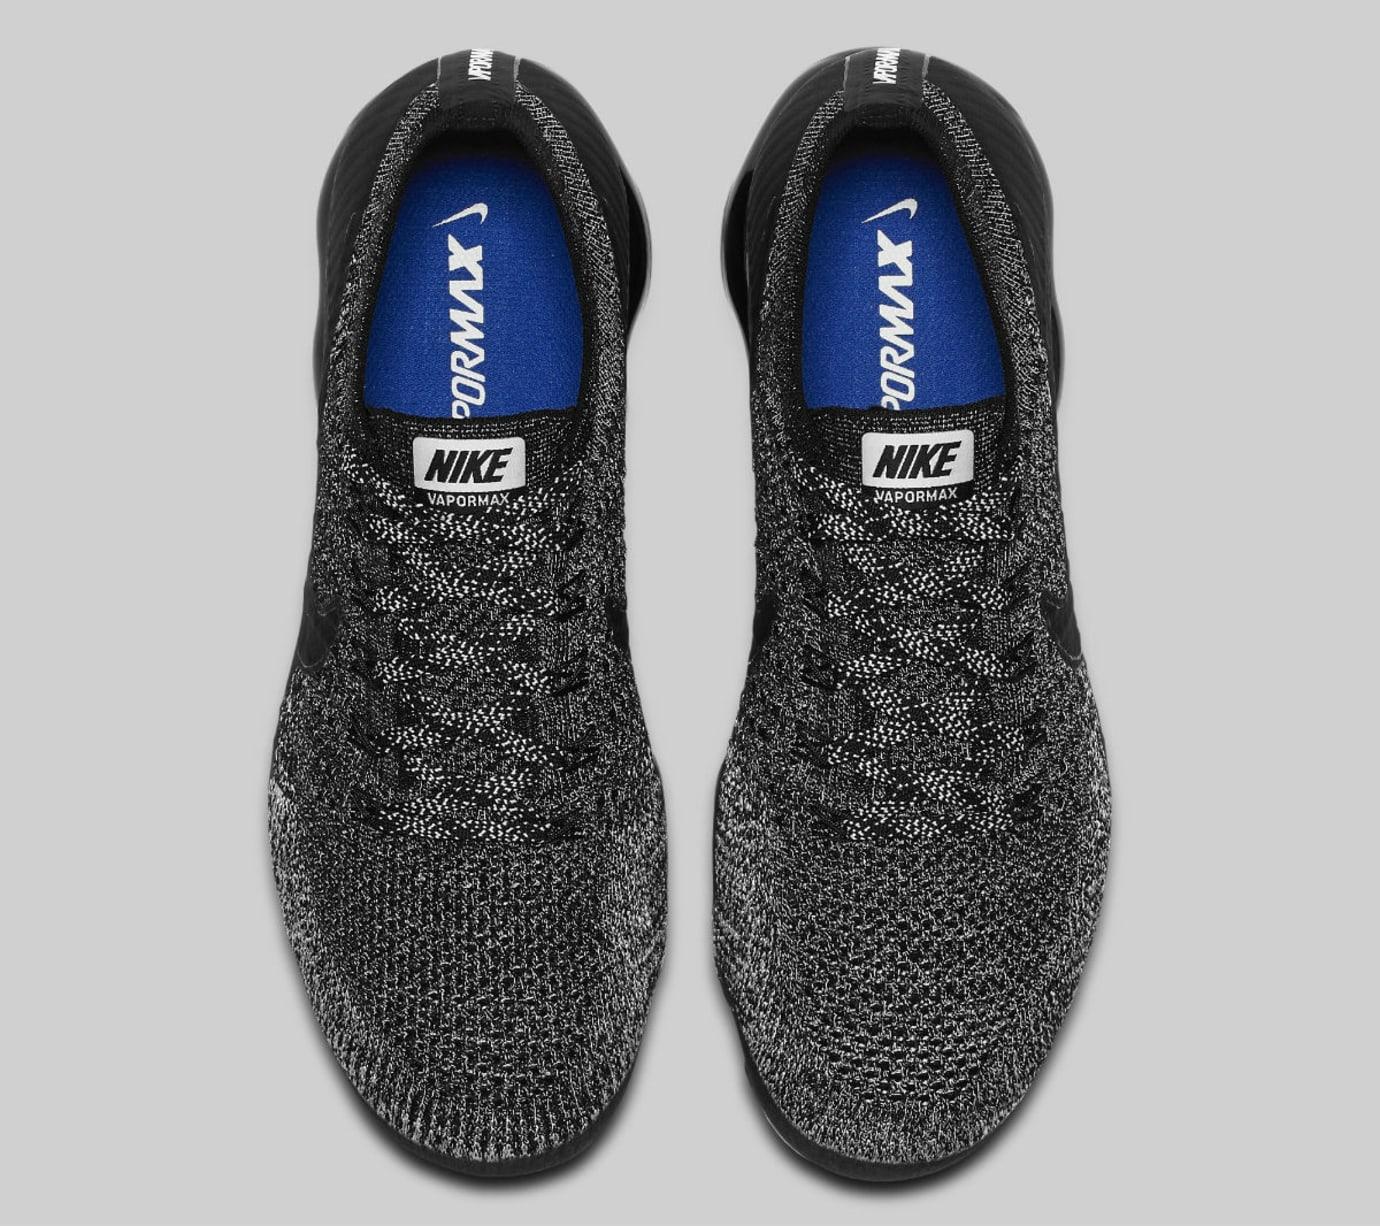 Nike Air VaporMax Oreo 2.0 Pack Release Date Top 849558-041